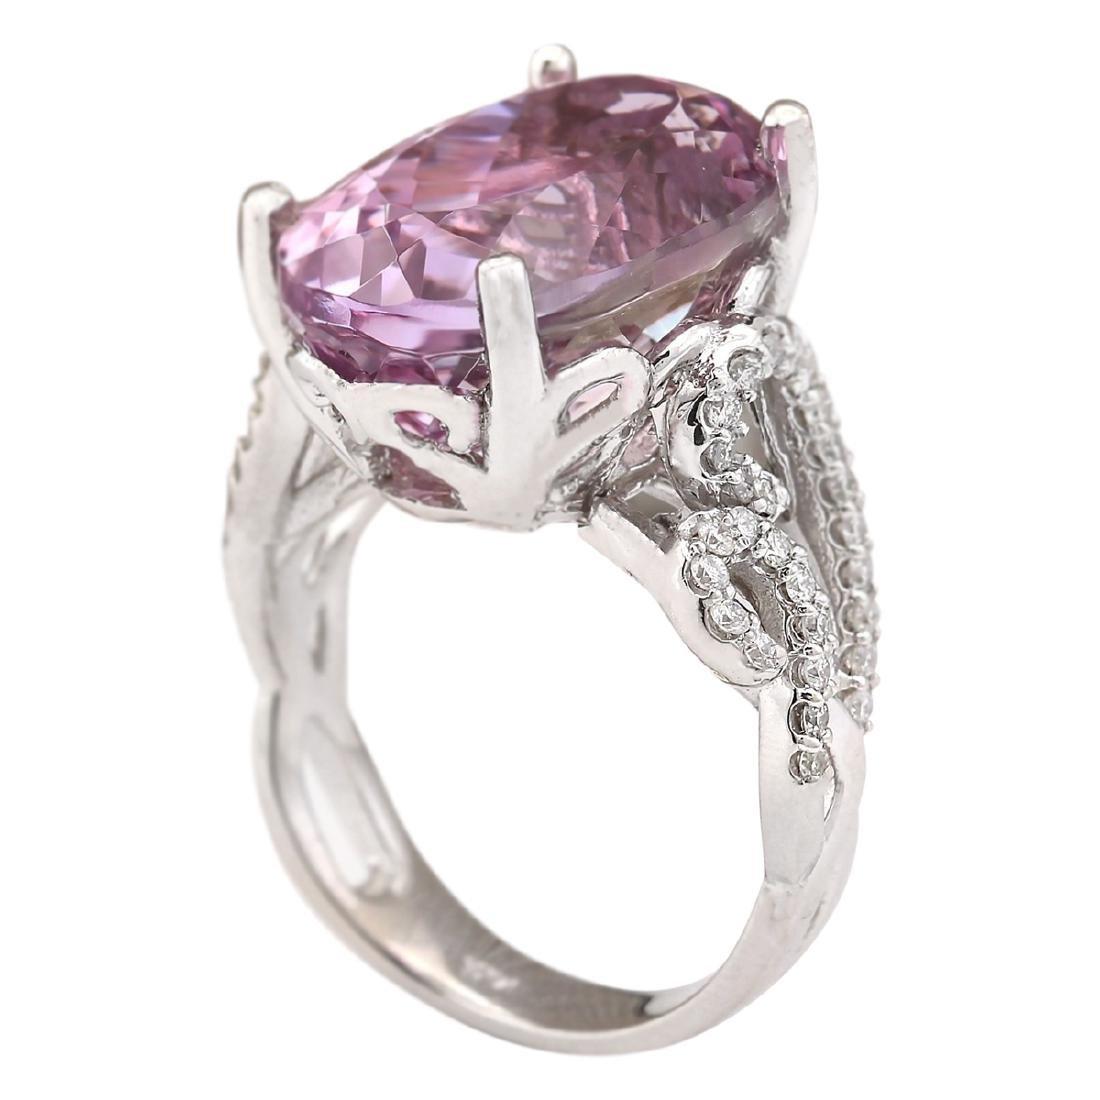 13.86 CTW Natural Kunzite And Diamond Ring In 18K White - 4